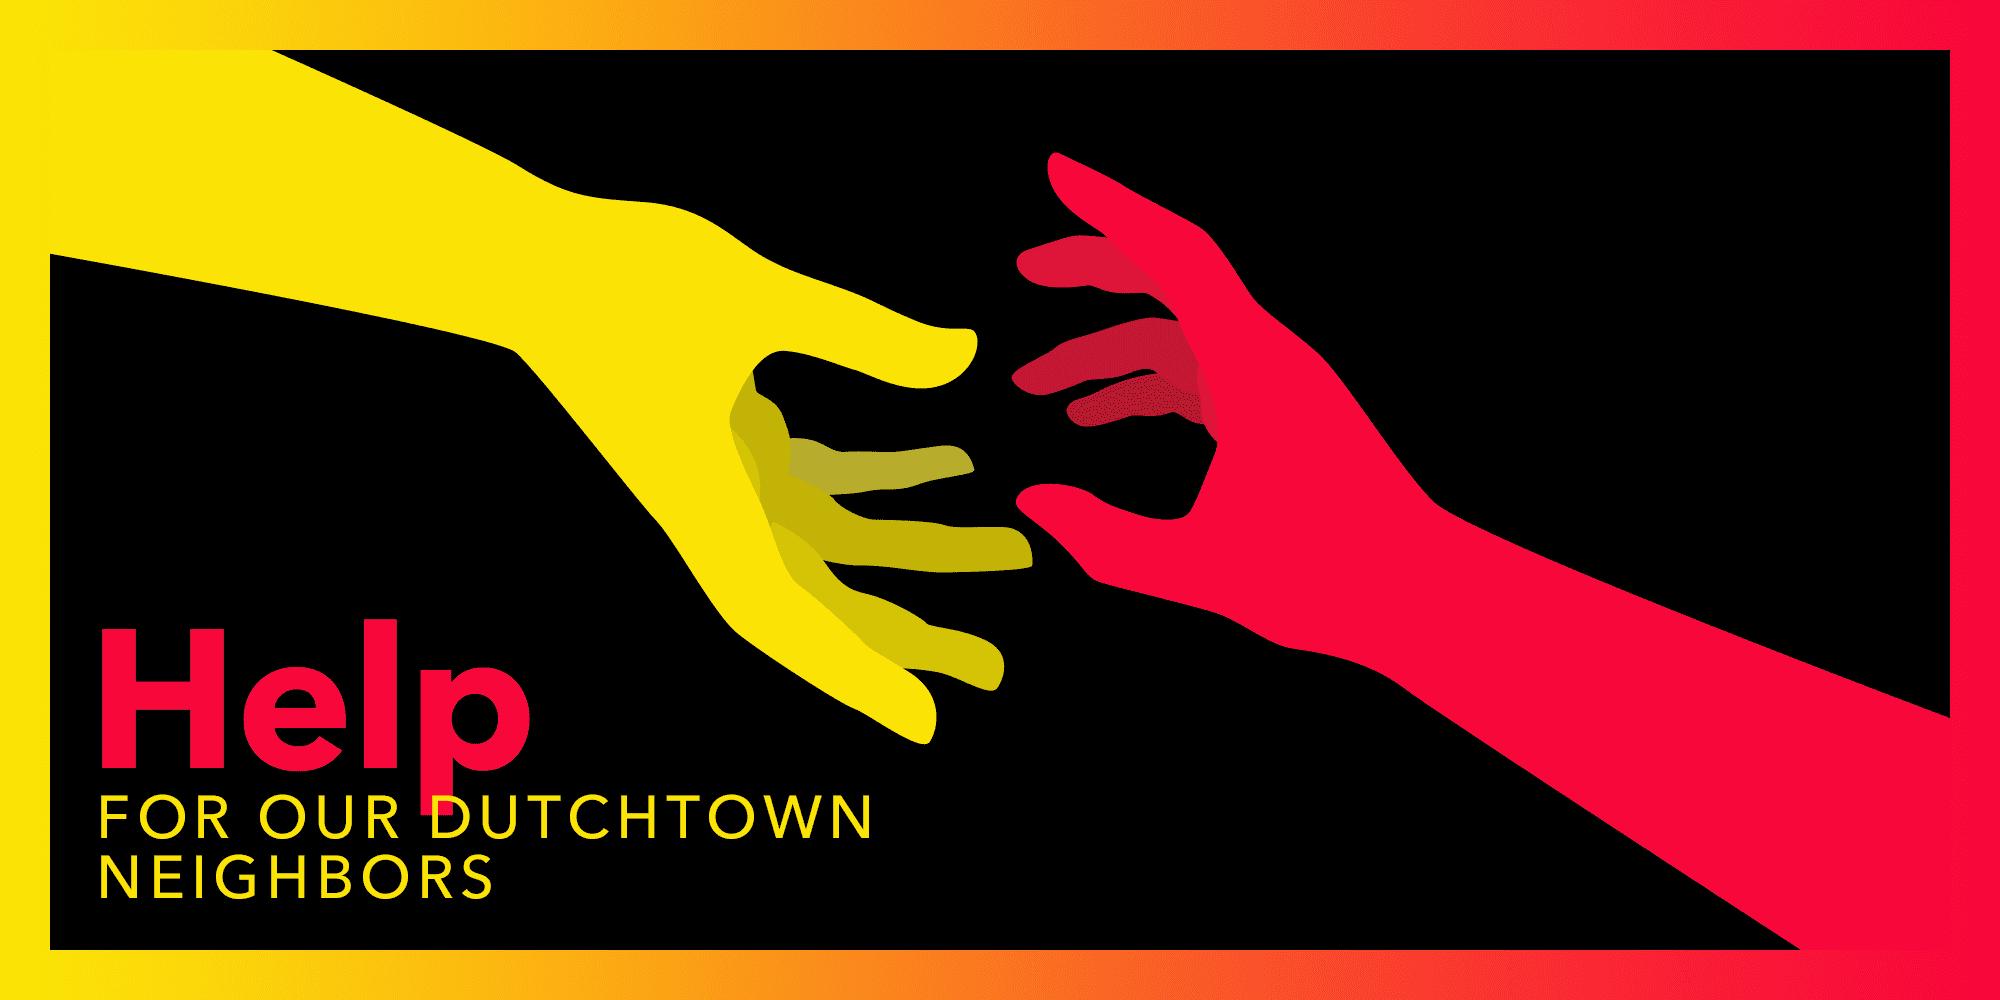 Help for our Dutchtown neighbors.